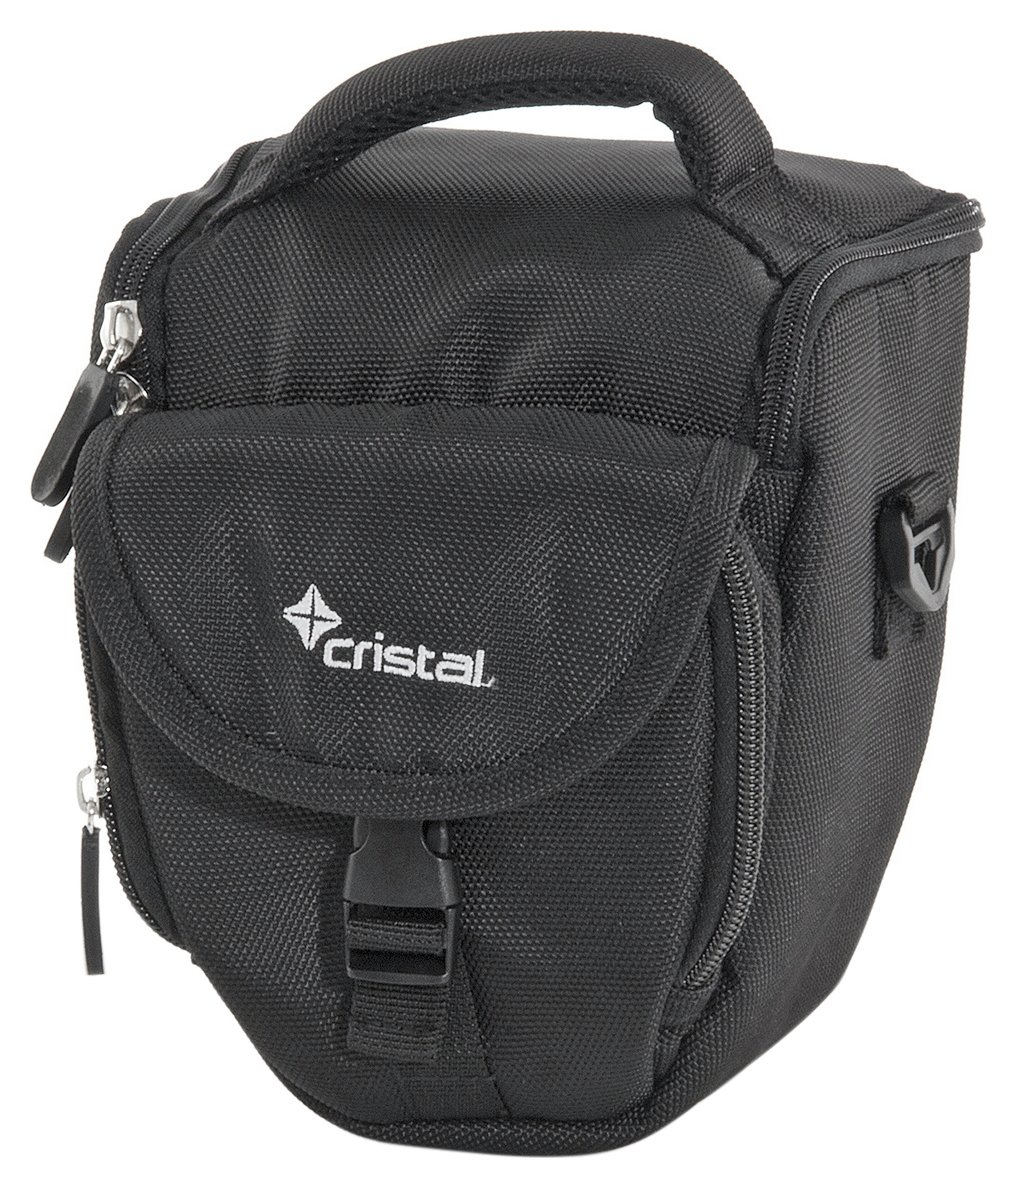 Image of Cristal - Bridge - Camera Case - Black